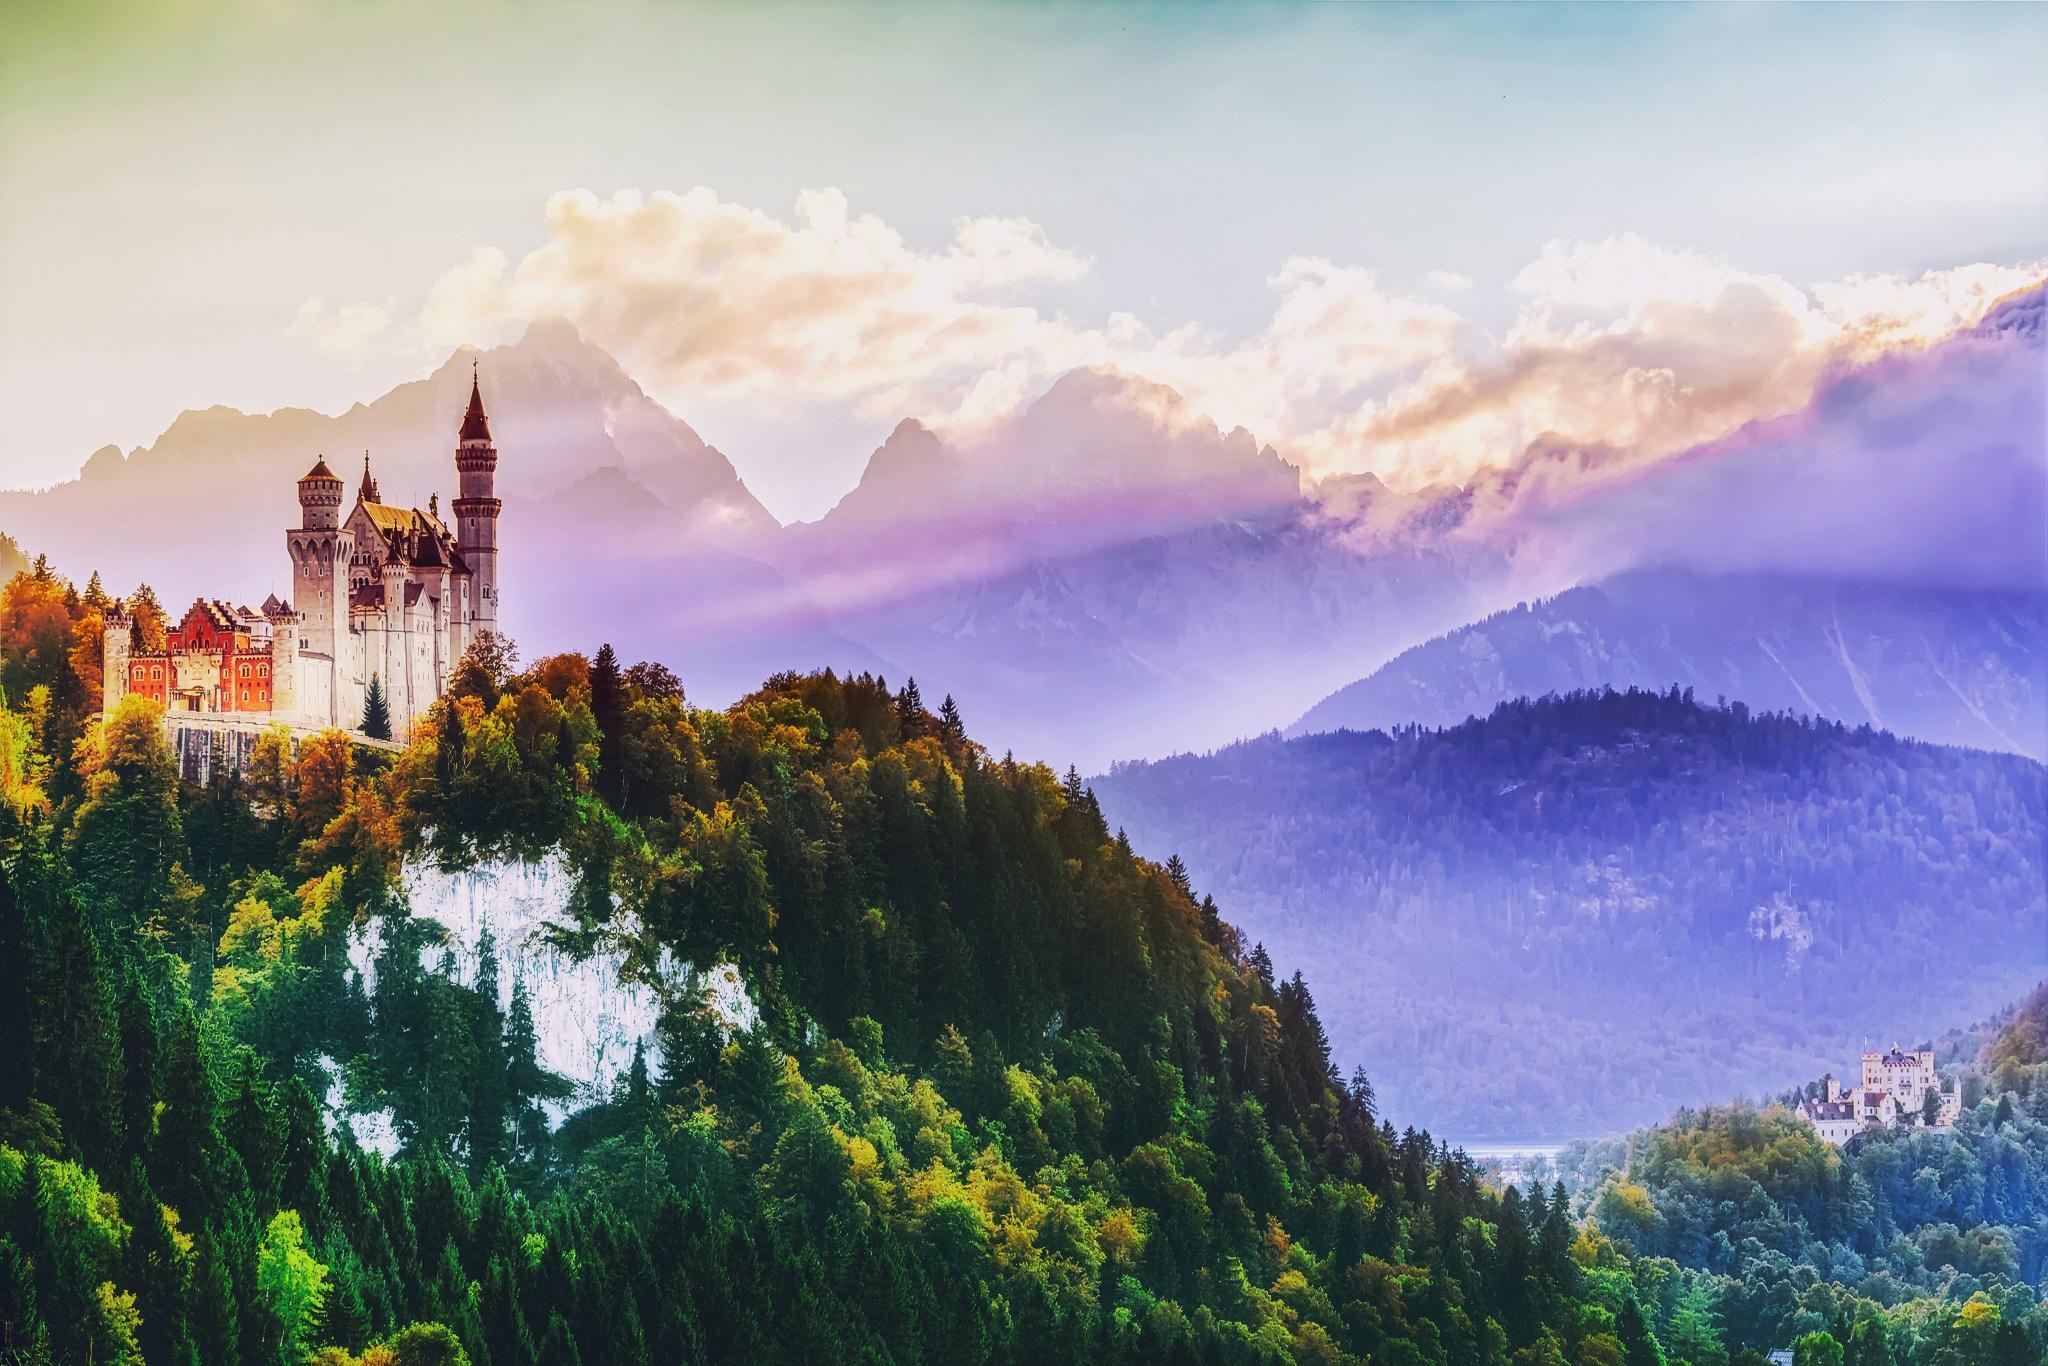 картинка замок за горами малоярославца адреса, телефоны